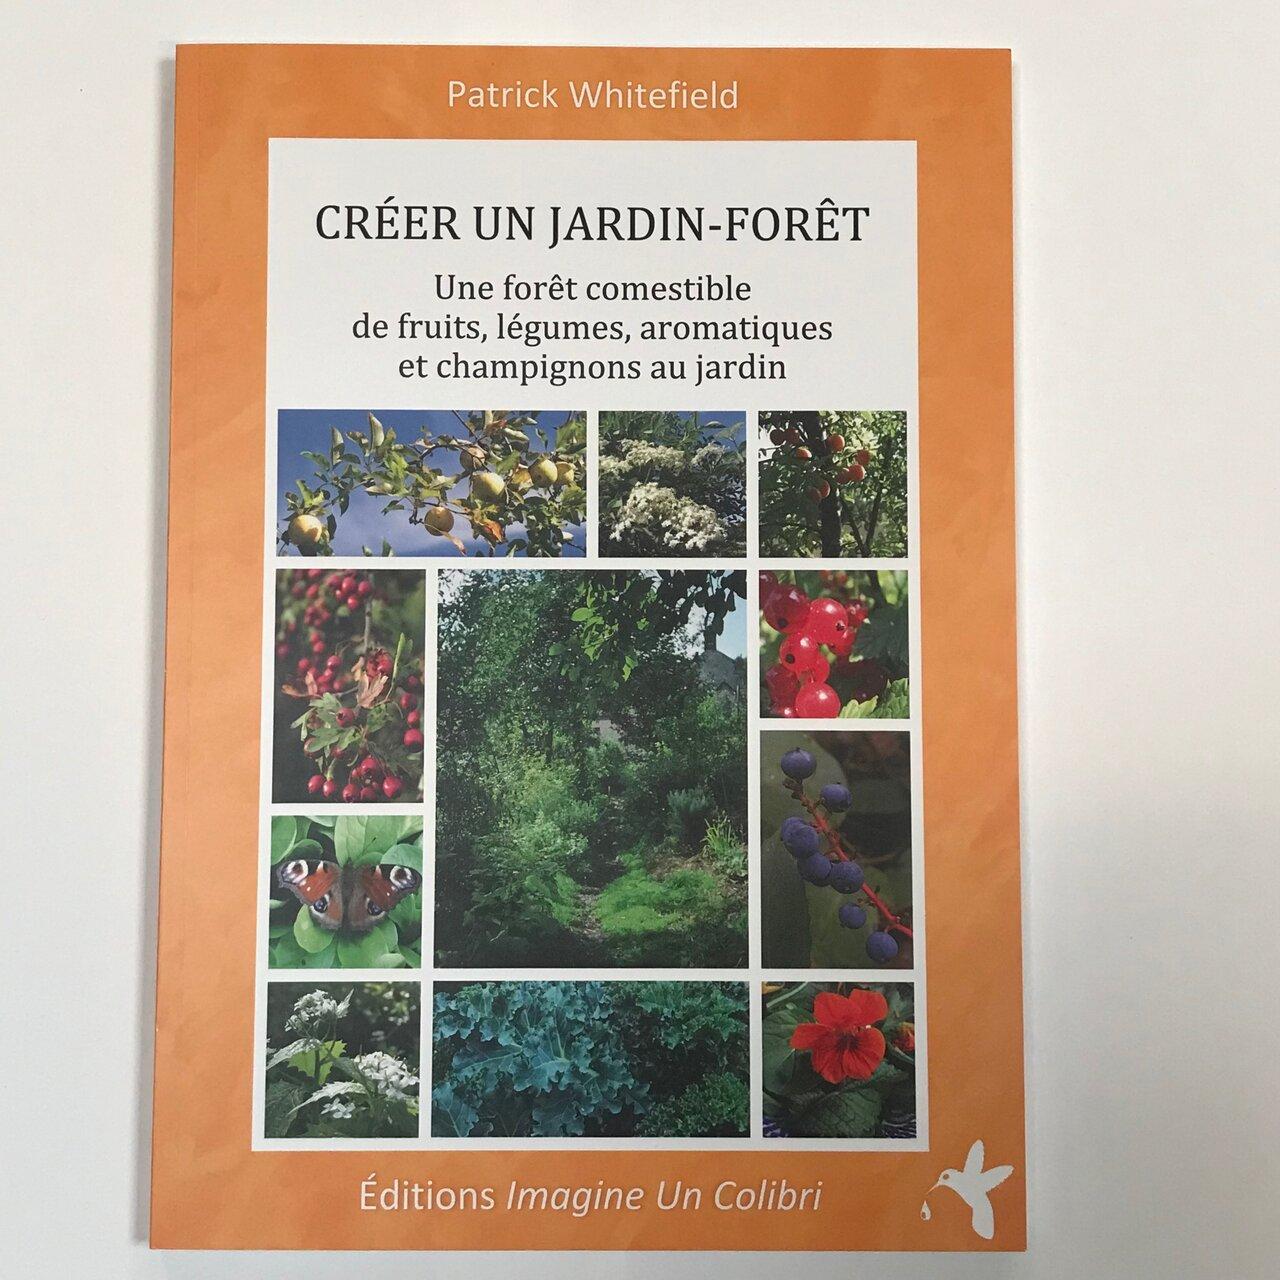 Jardinage - Créer un jardin-forêt